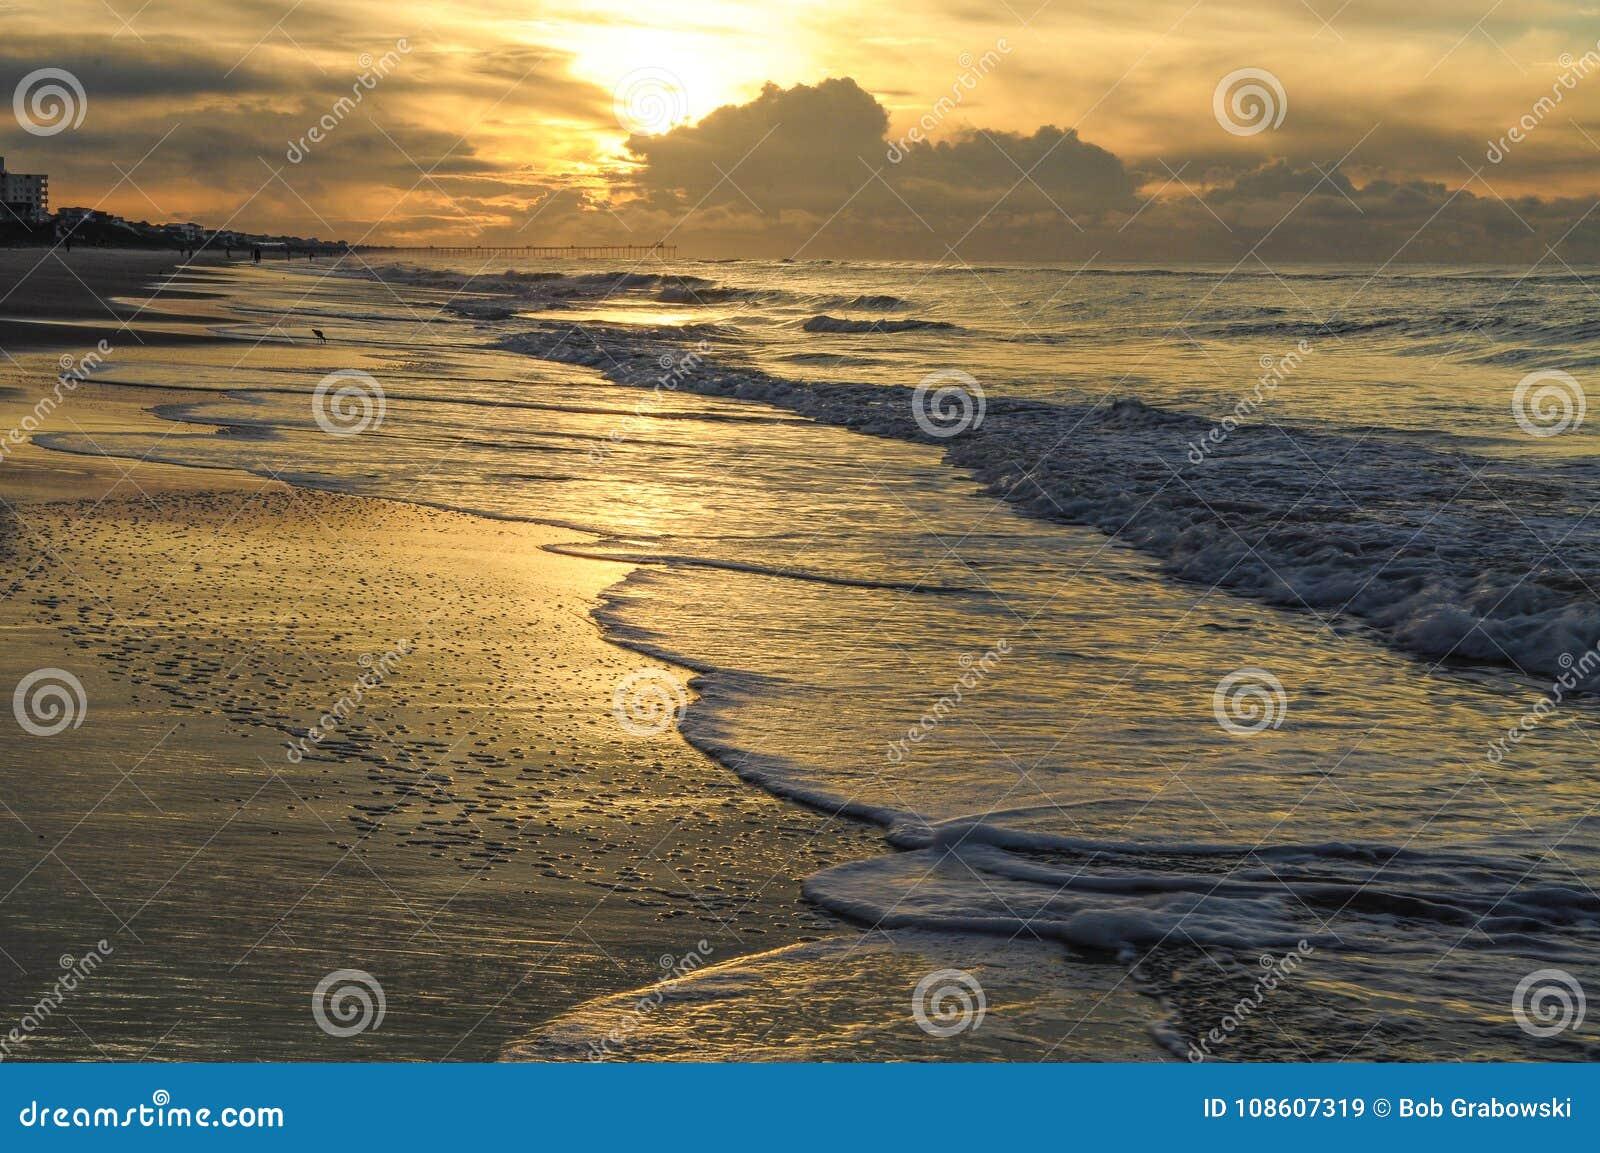 Sunrise Along The Beach Of Emerald Isle In North Carolina